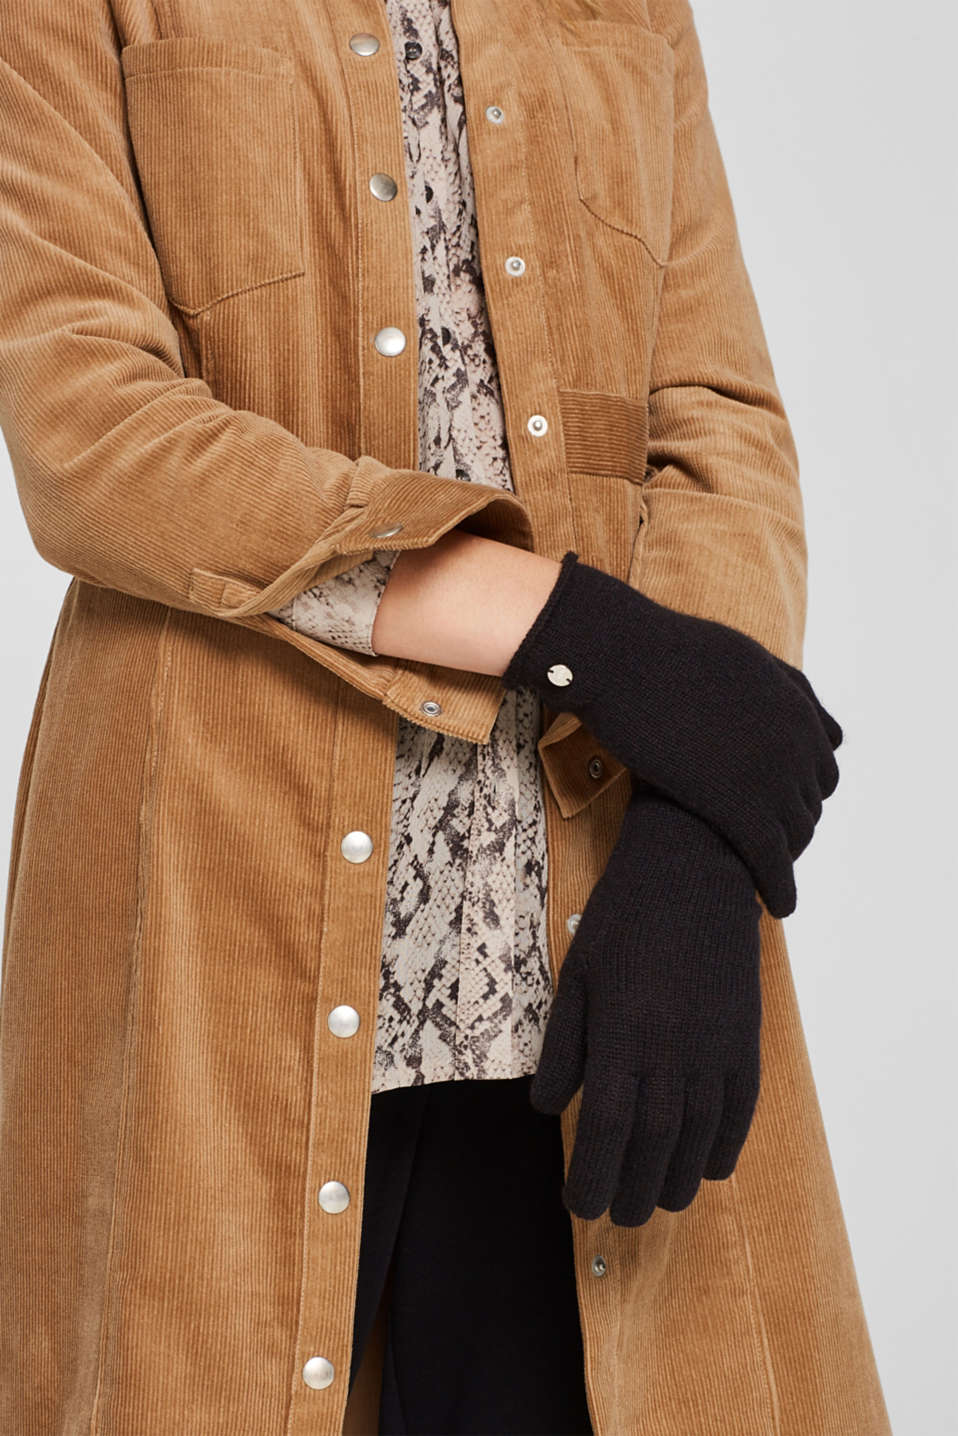 Knit gloves in a cashmere/wool blend, BLACK, detail image number 2